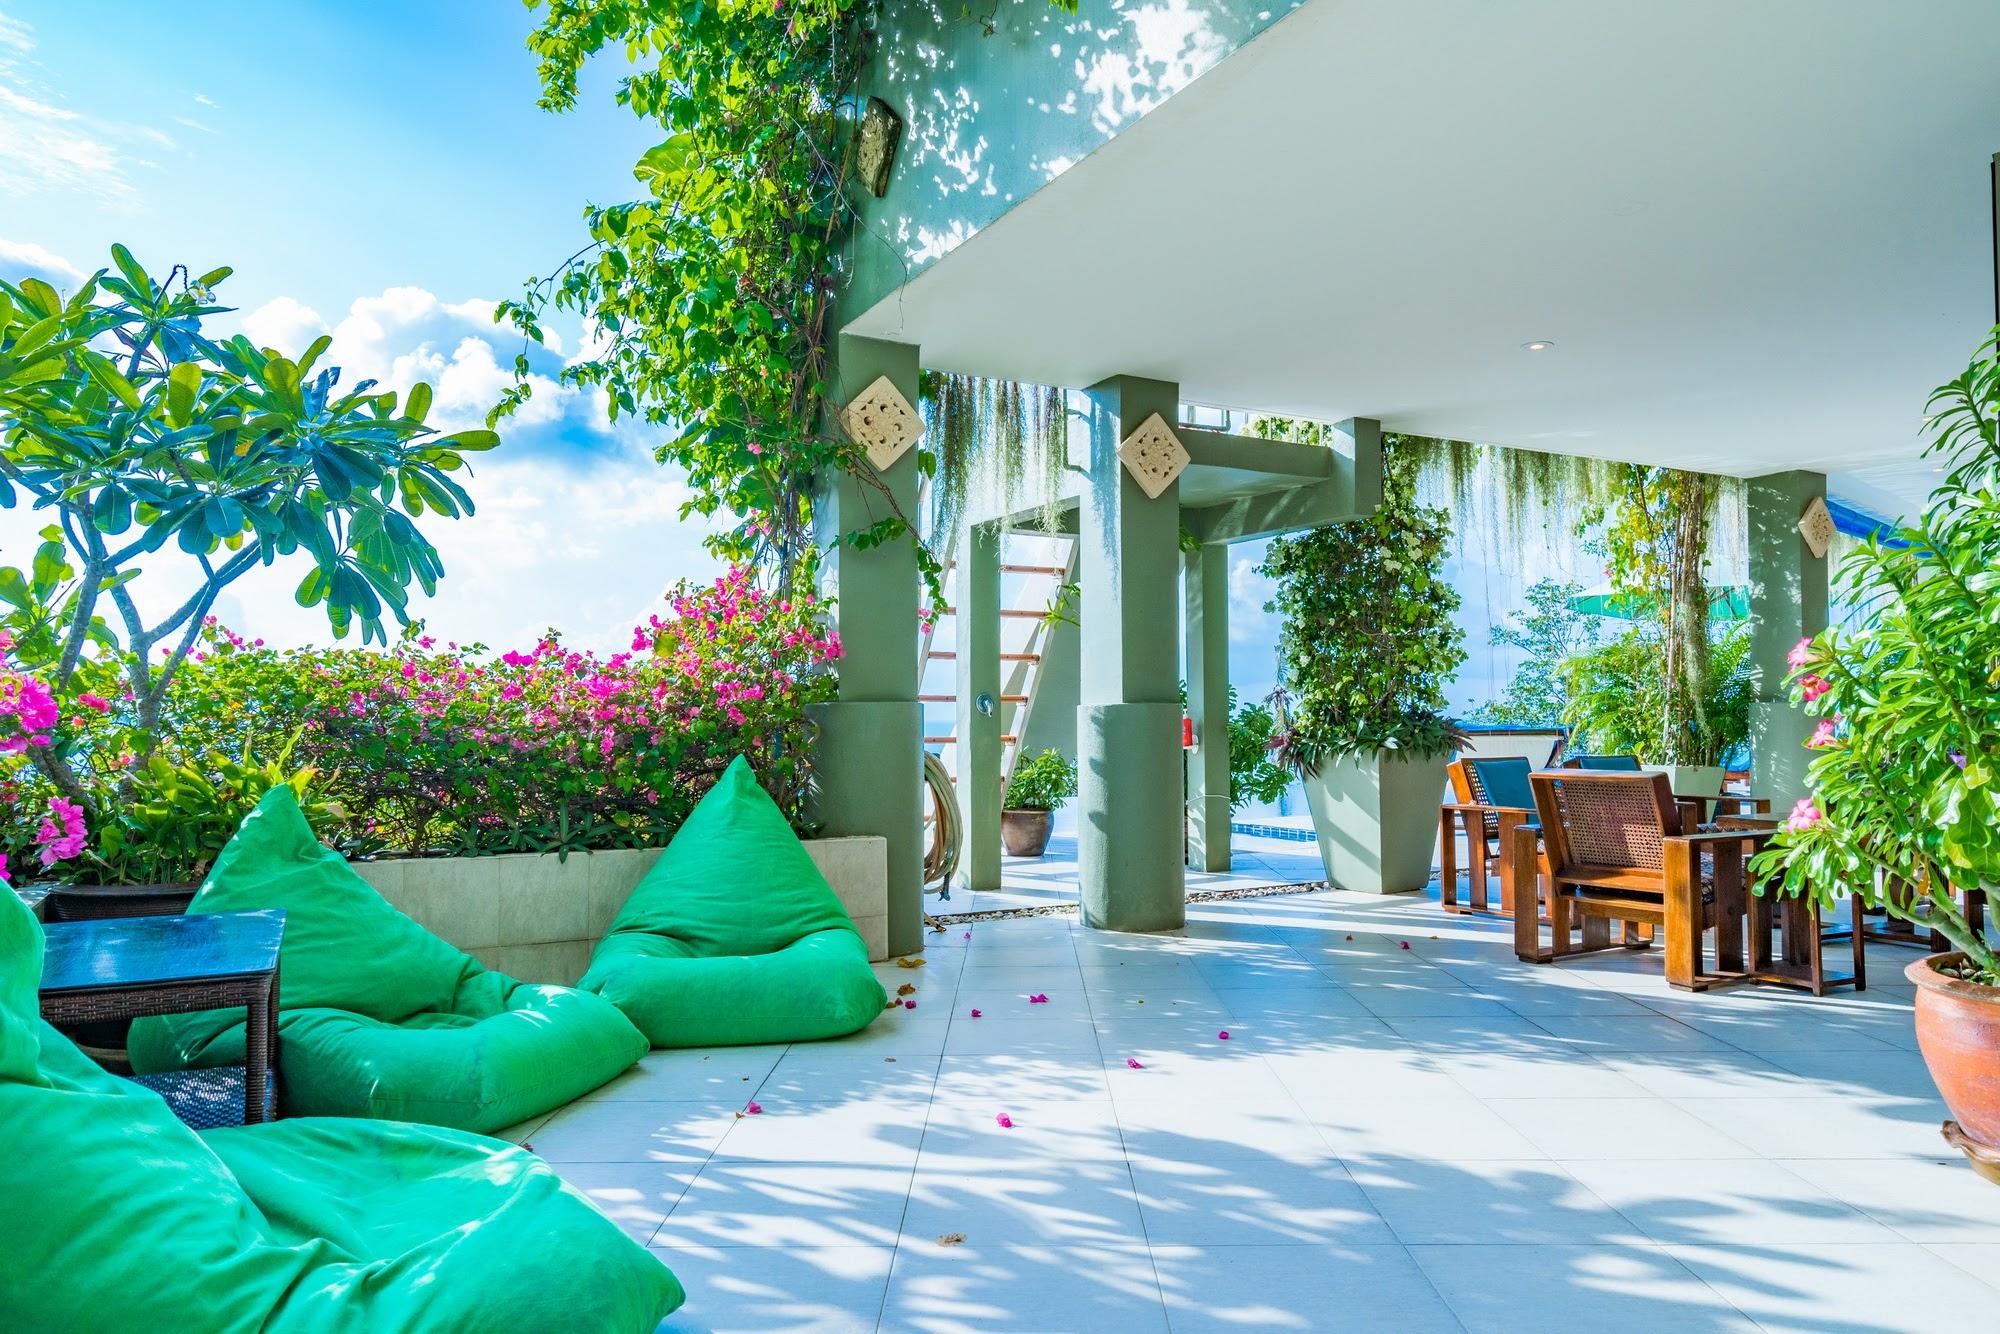 Koh+Samui+Vacation+Villa+Pool+Sea+View+(20).jpg